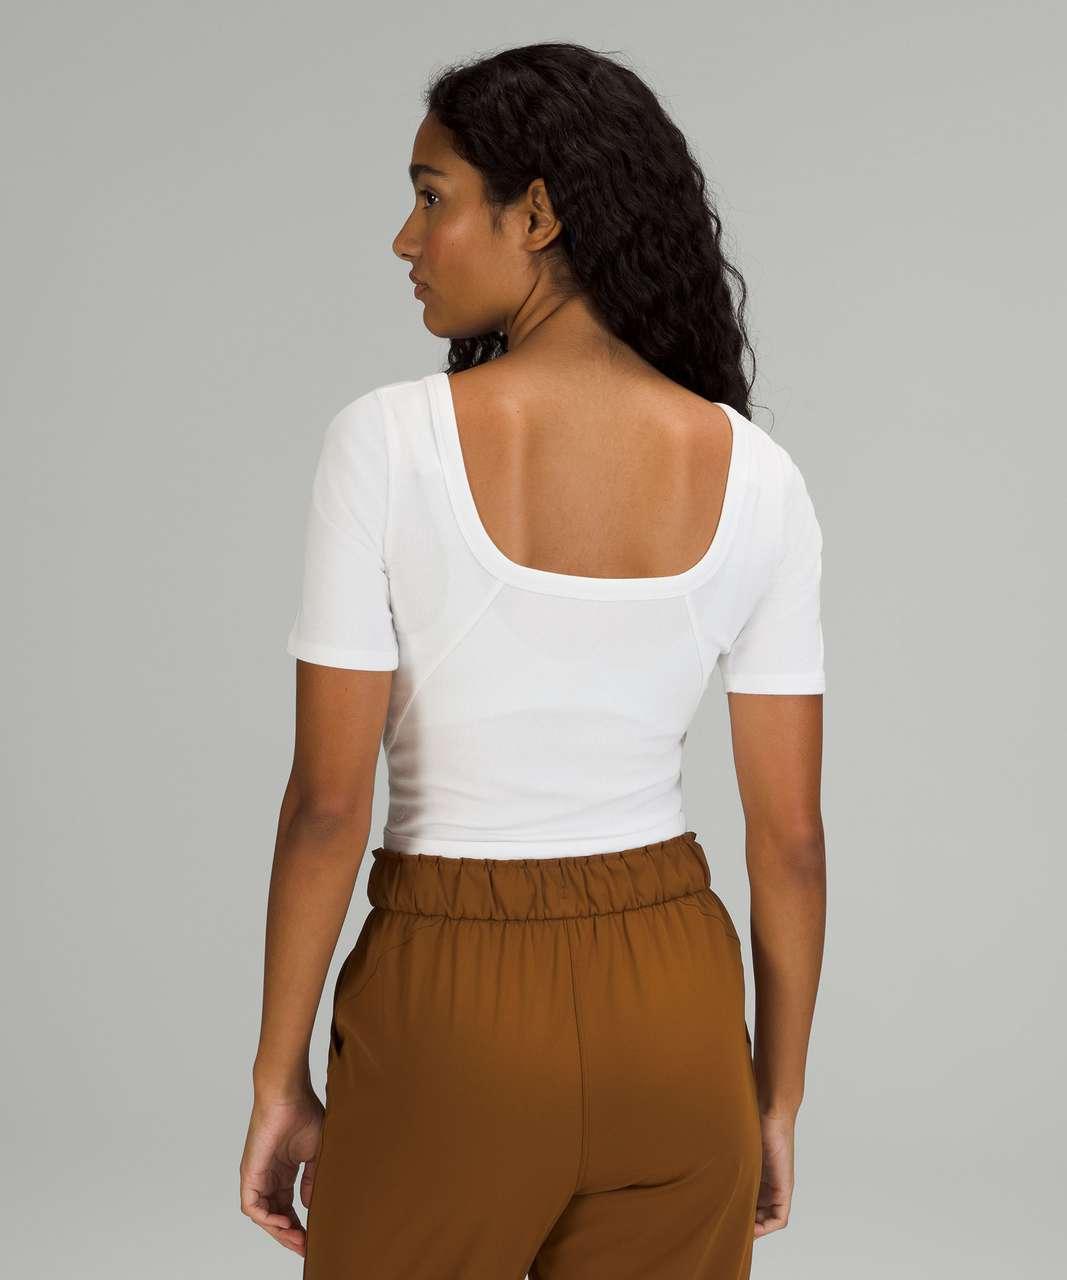 Lululemon Ribbed Held Tight Short Sleeve Shirt - White